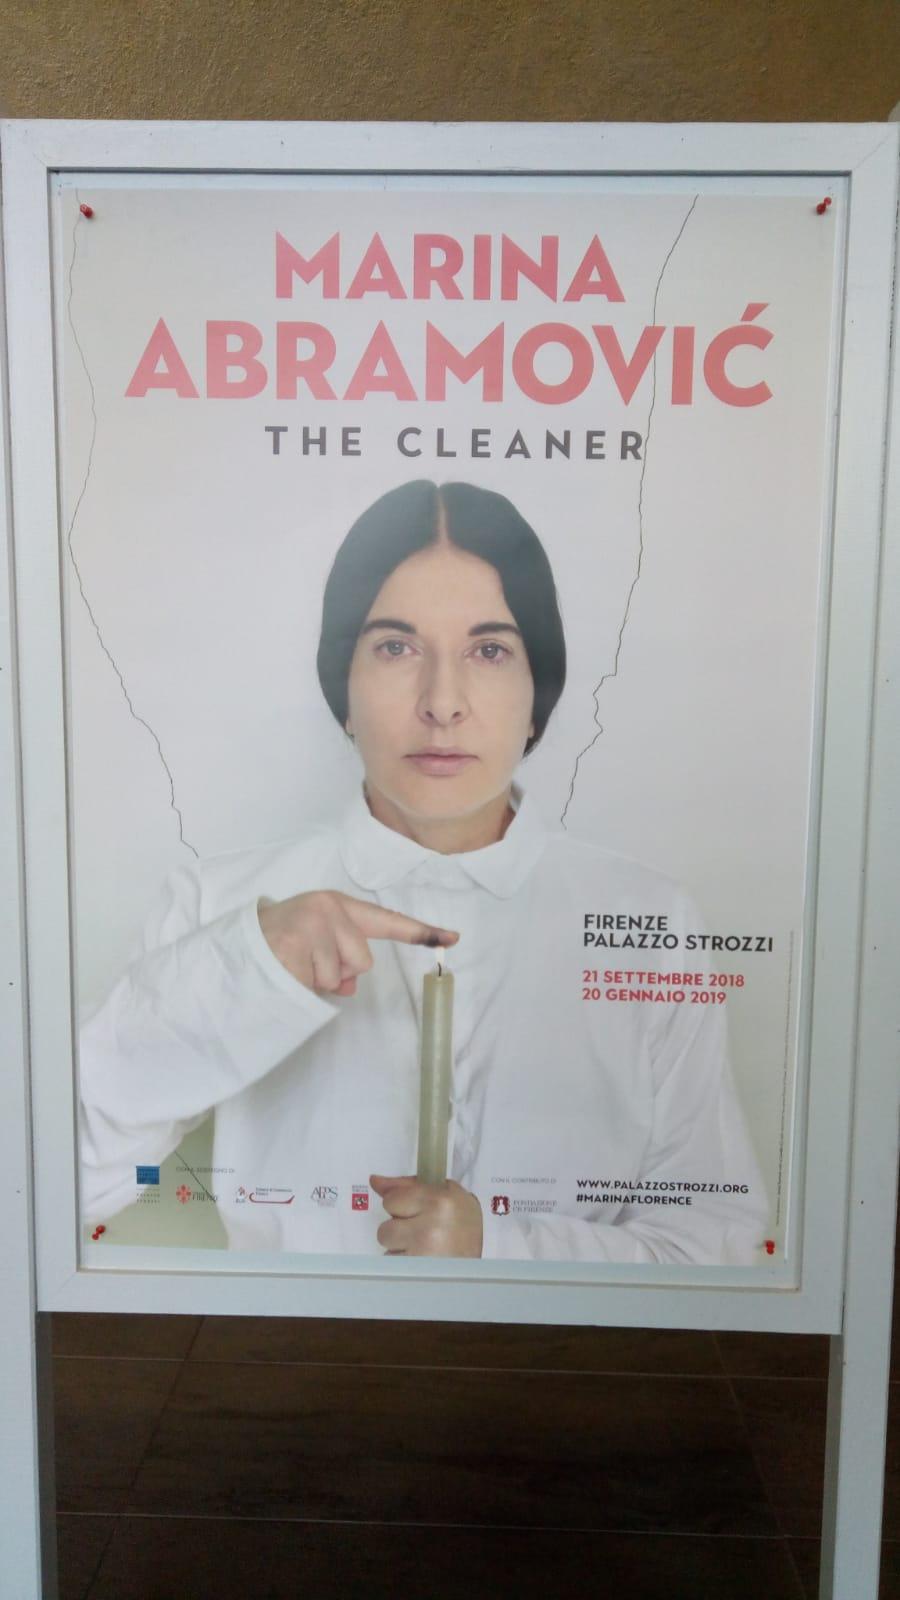 Marina Abramovic - The Cleaner